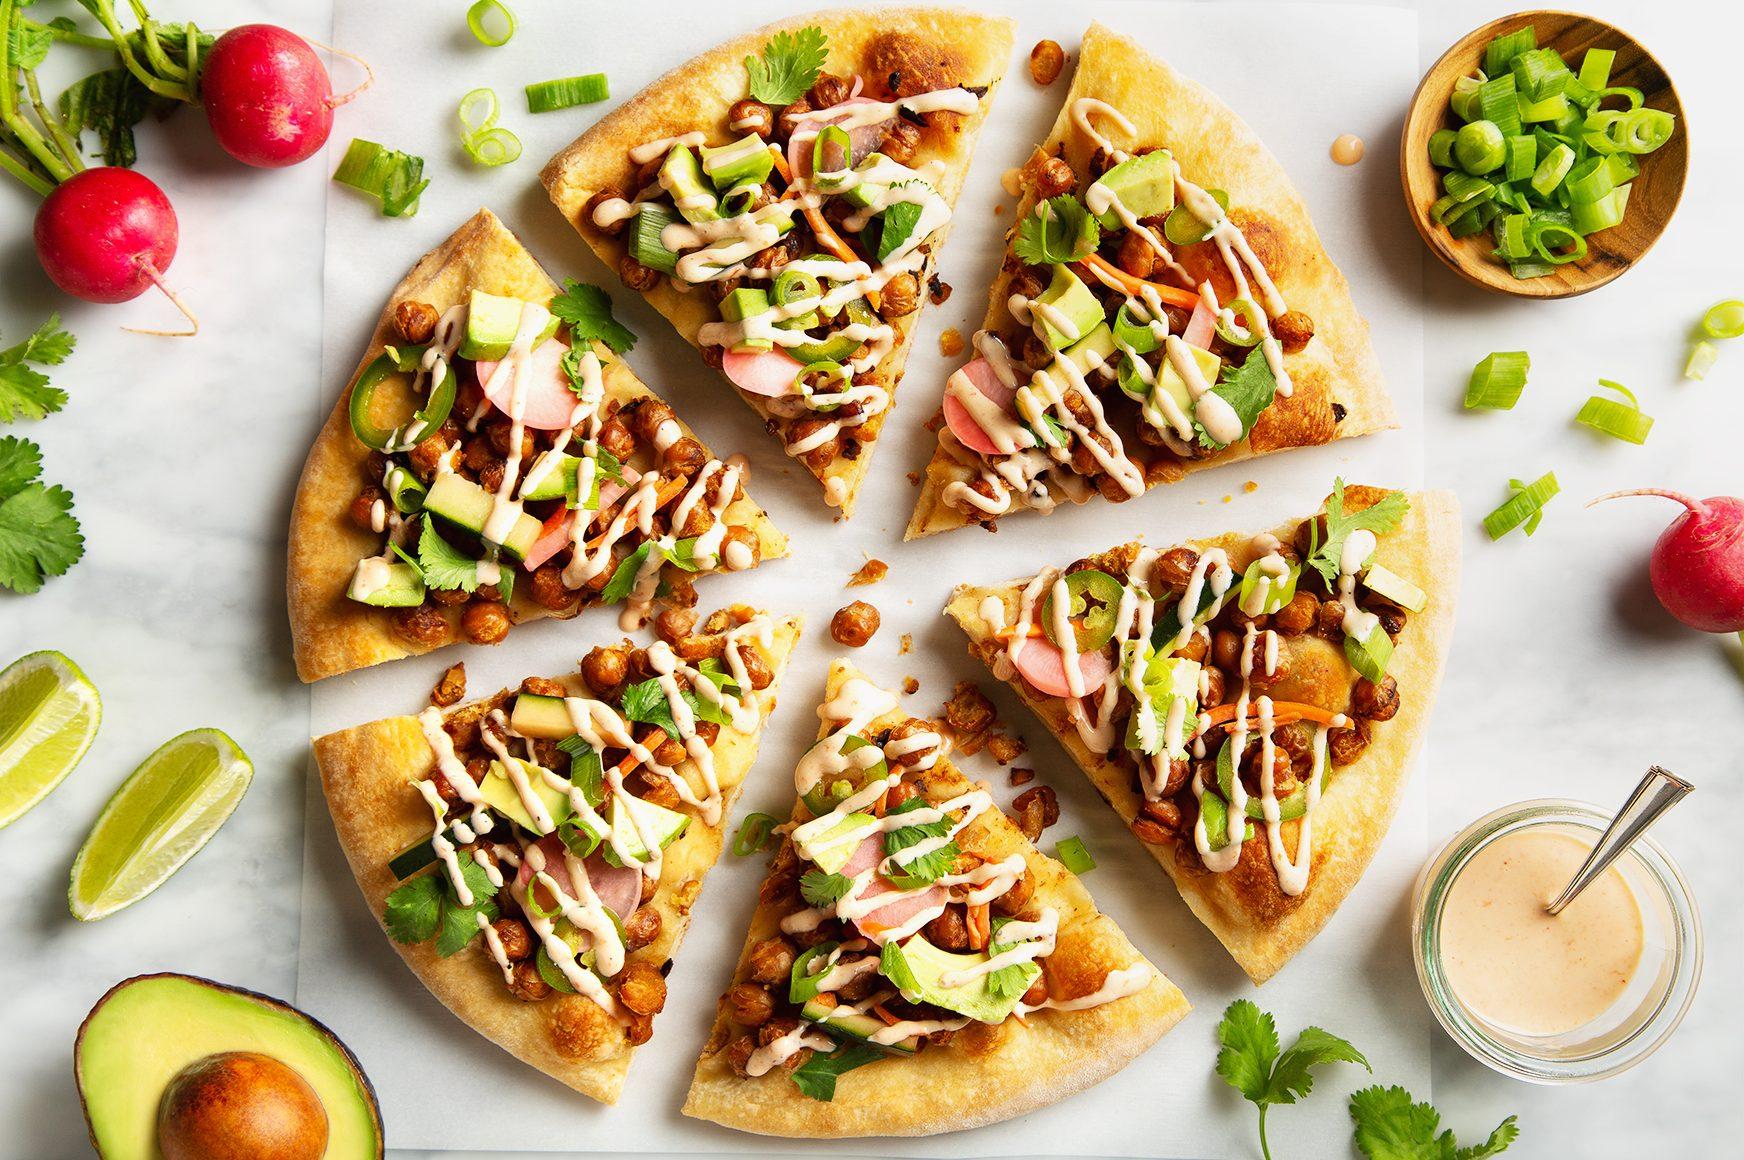 Crispy Chickpea Banh Mi Pizza with Quick Homemade Pickles! | picklesnhoney.com #chickpea #banhmi #pizza #vegan #lunch #dinner #recipe